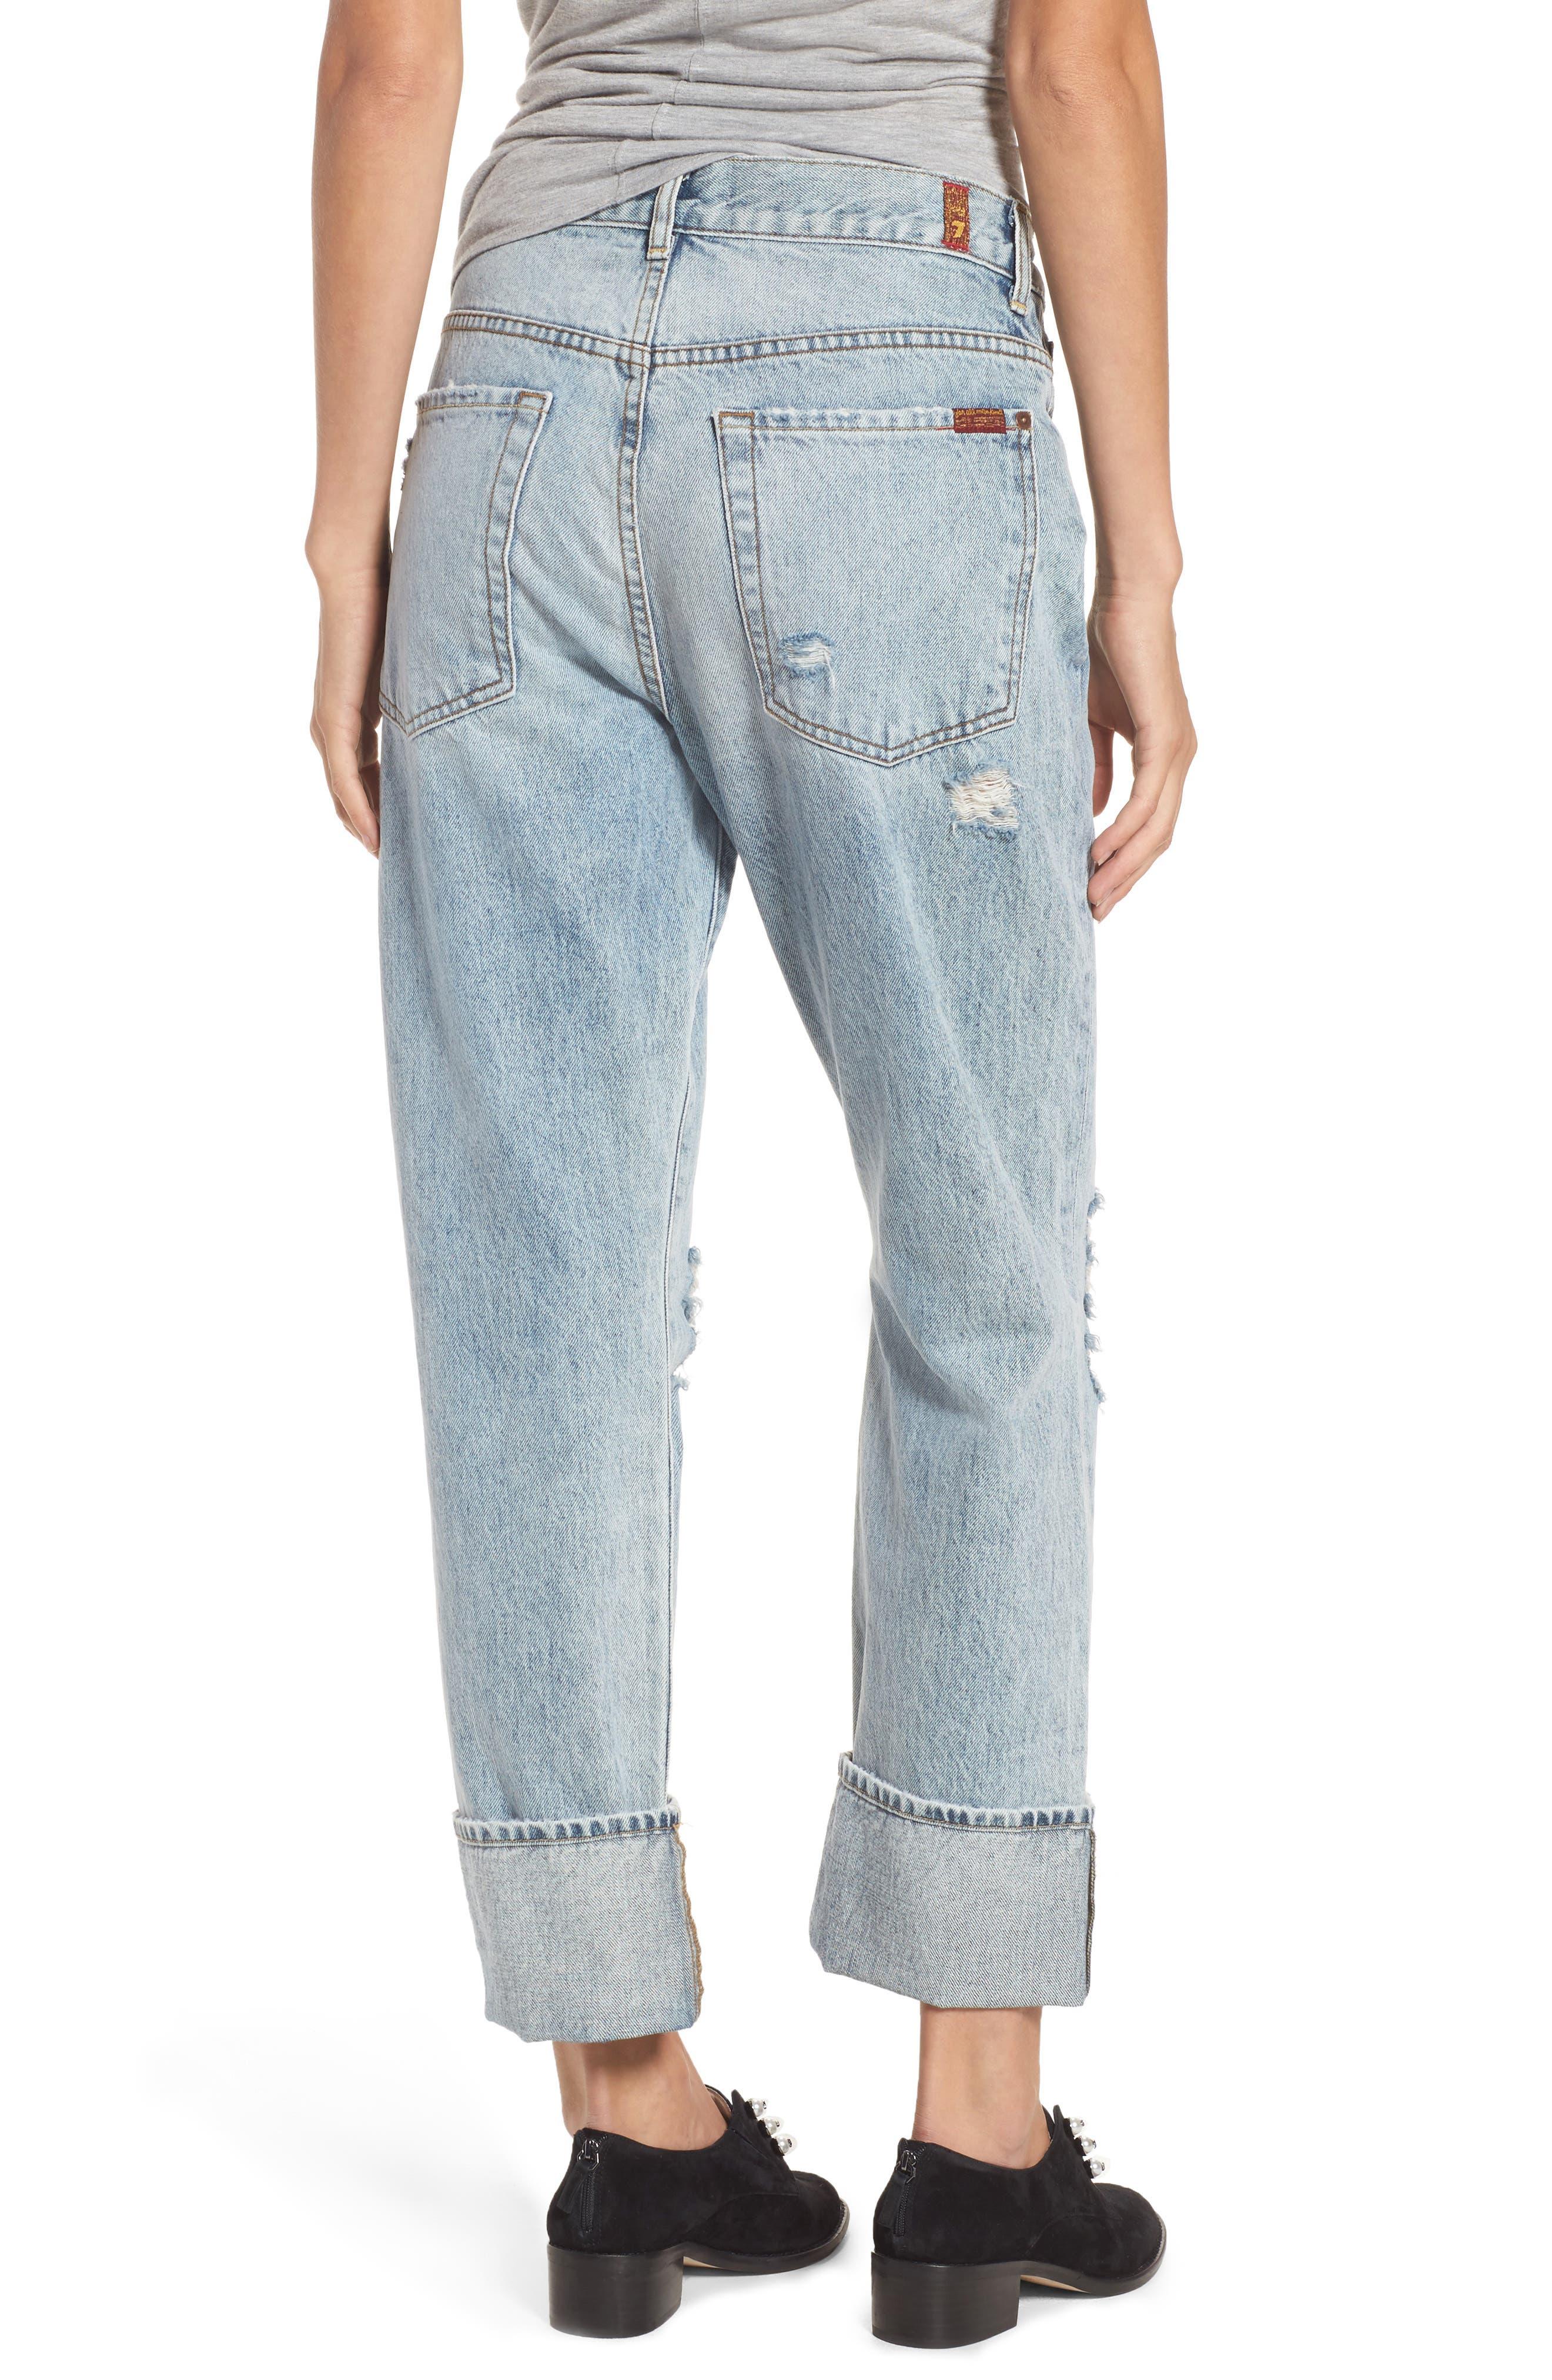 Rickie High Waist Boyfriend Jeans,                             Alternate thumbnail 3, color,                             Mineral Desert Springs 3